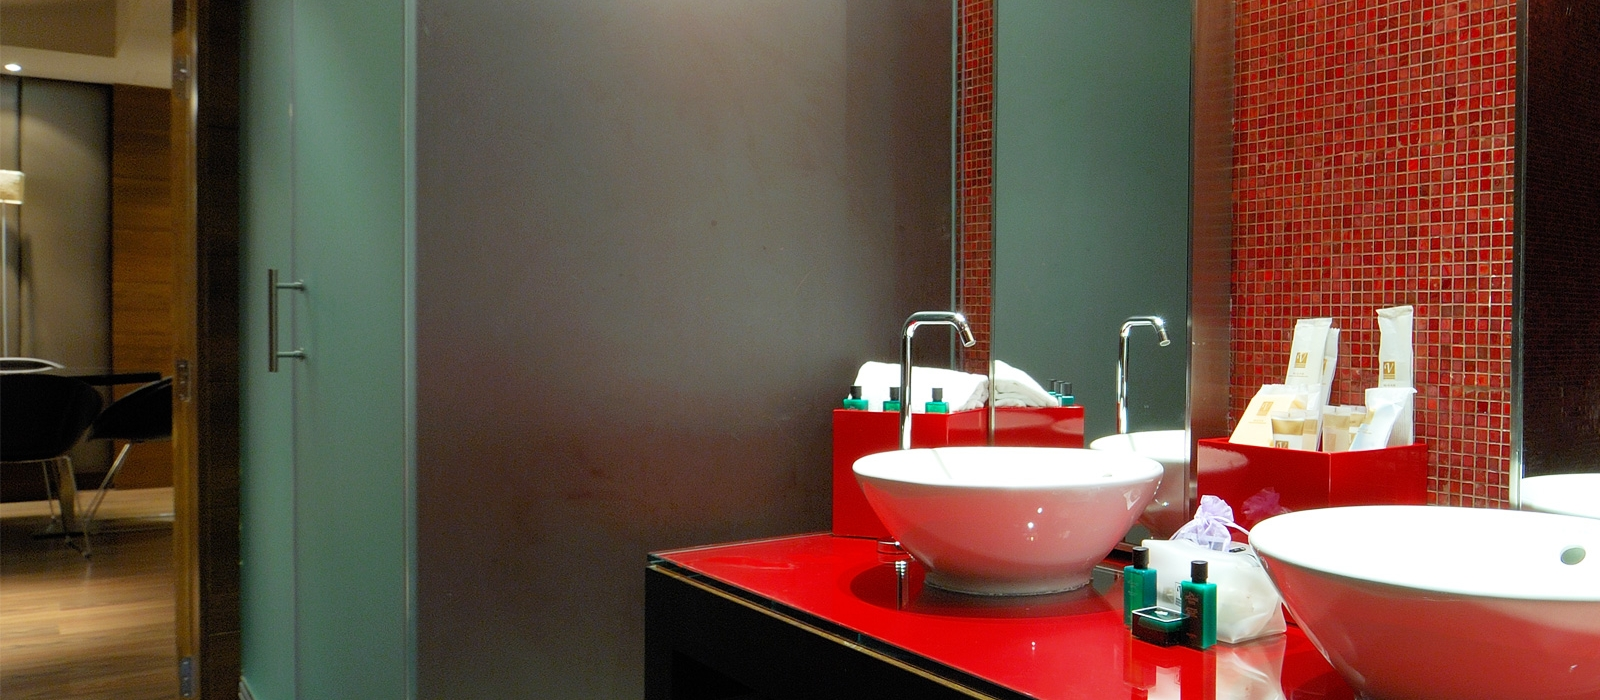 Übernachtung im Hotel Vincci Soho in Madrid - Doppelzimmer